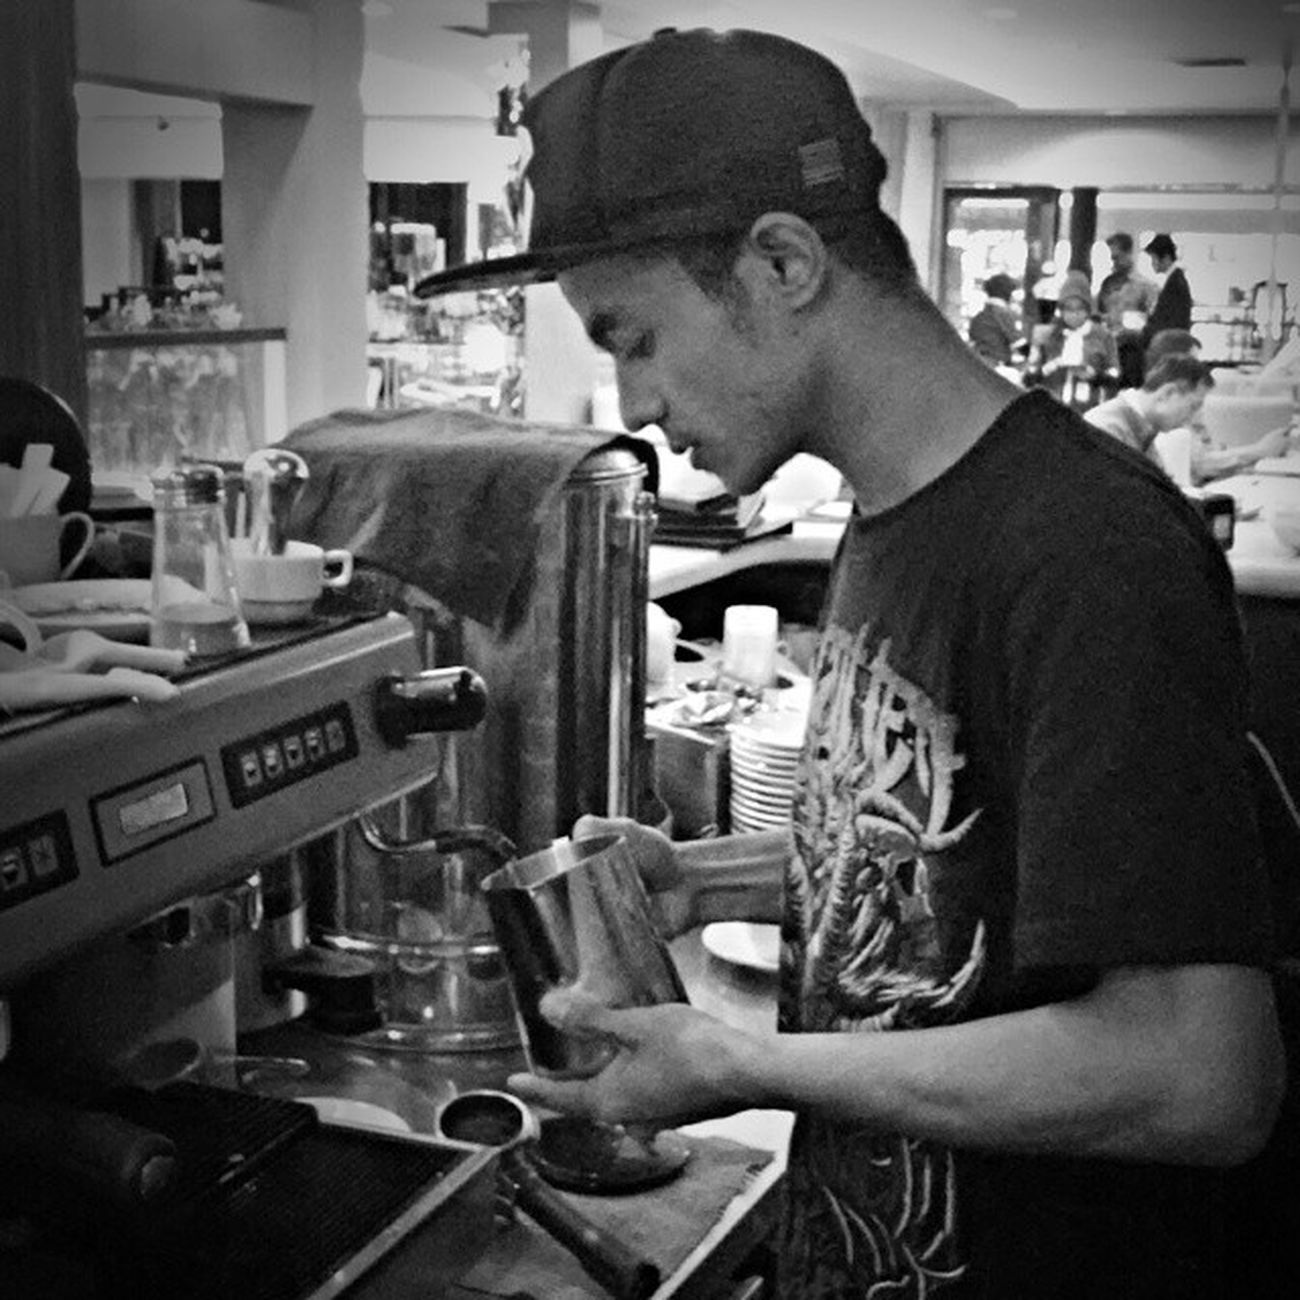 Anclomkeun TetapCadas Barista Indonesianbarista Metal FansClub terlaknat forgotten666 PUPPEN carimali instacoffee lattegram coffee coffeeaddict MetalHeads SmokinEngineMetal keheadproject profesi realistis